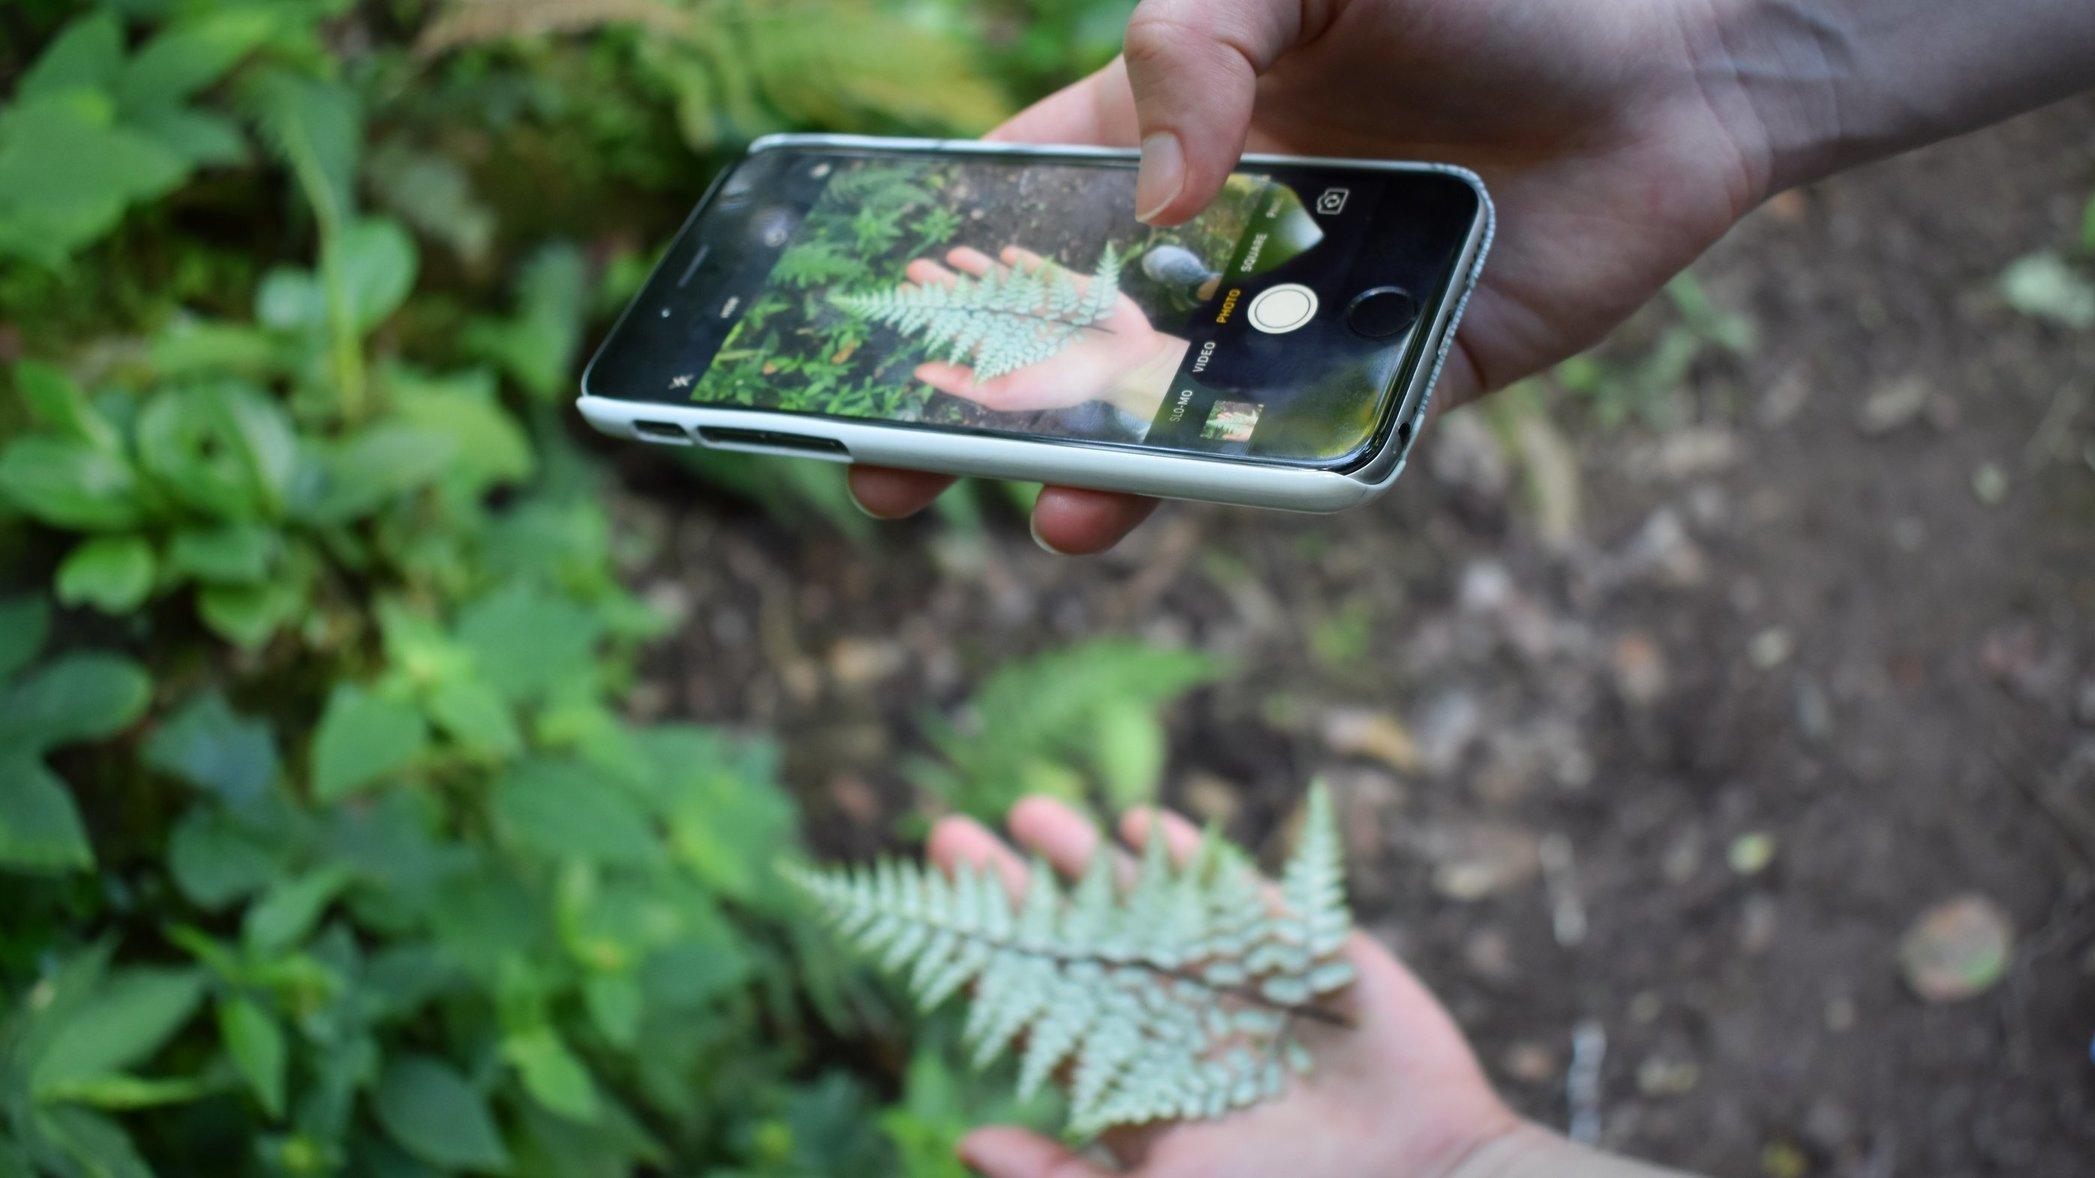 britton-perelman-smartphone-camera-tips-header.jpg